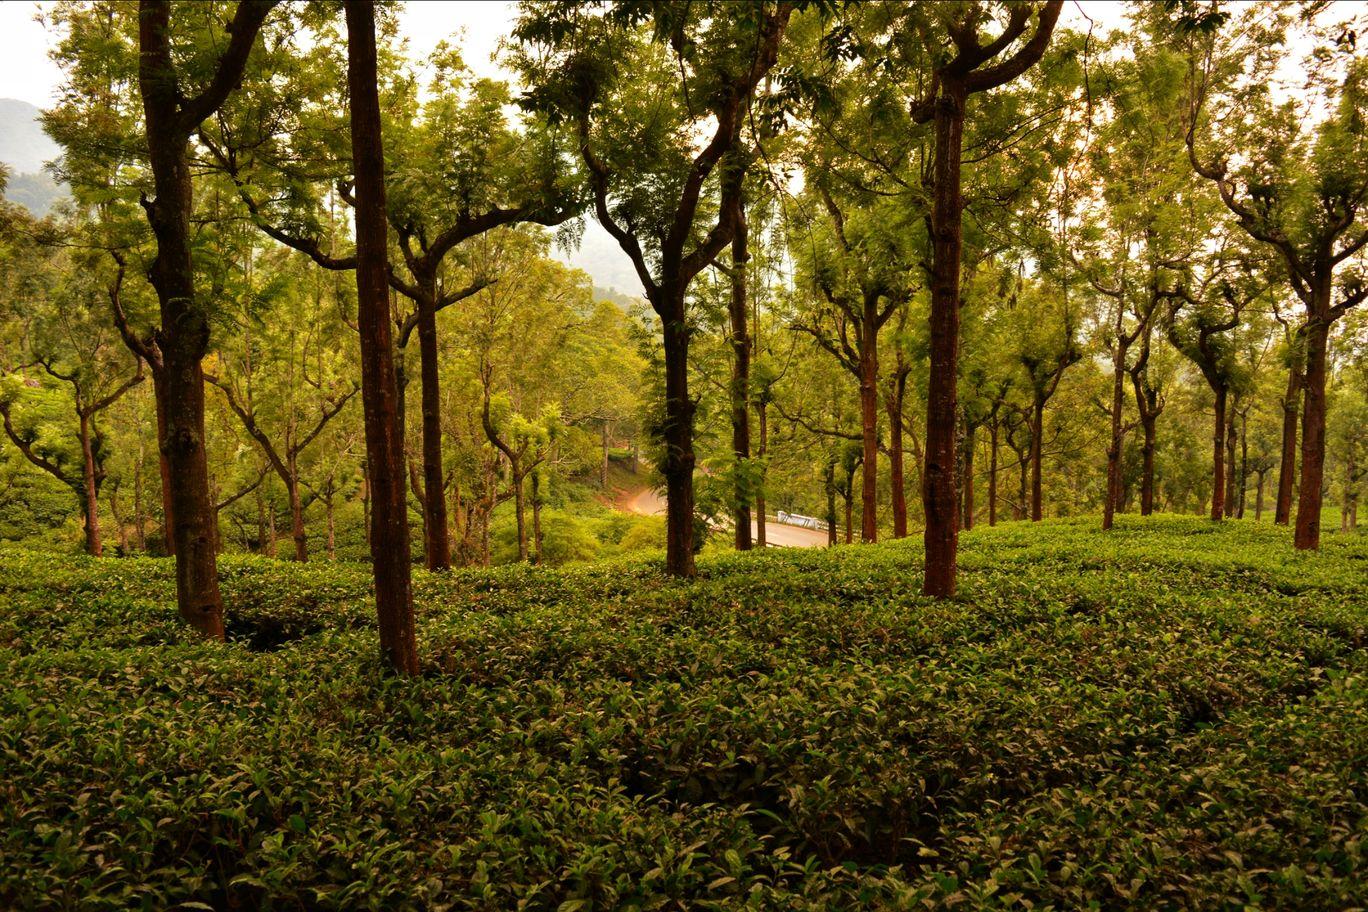 Photo of Ooty By Kiran Sharma